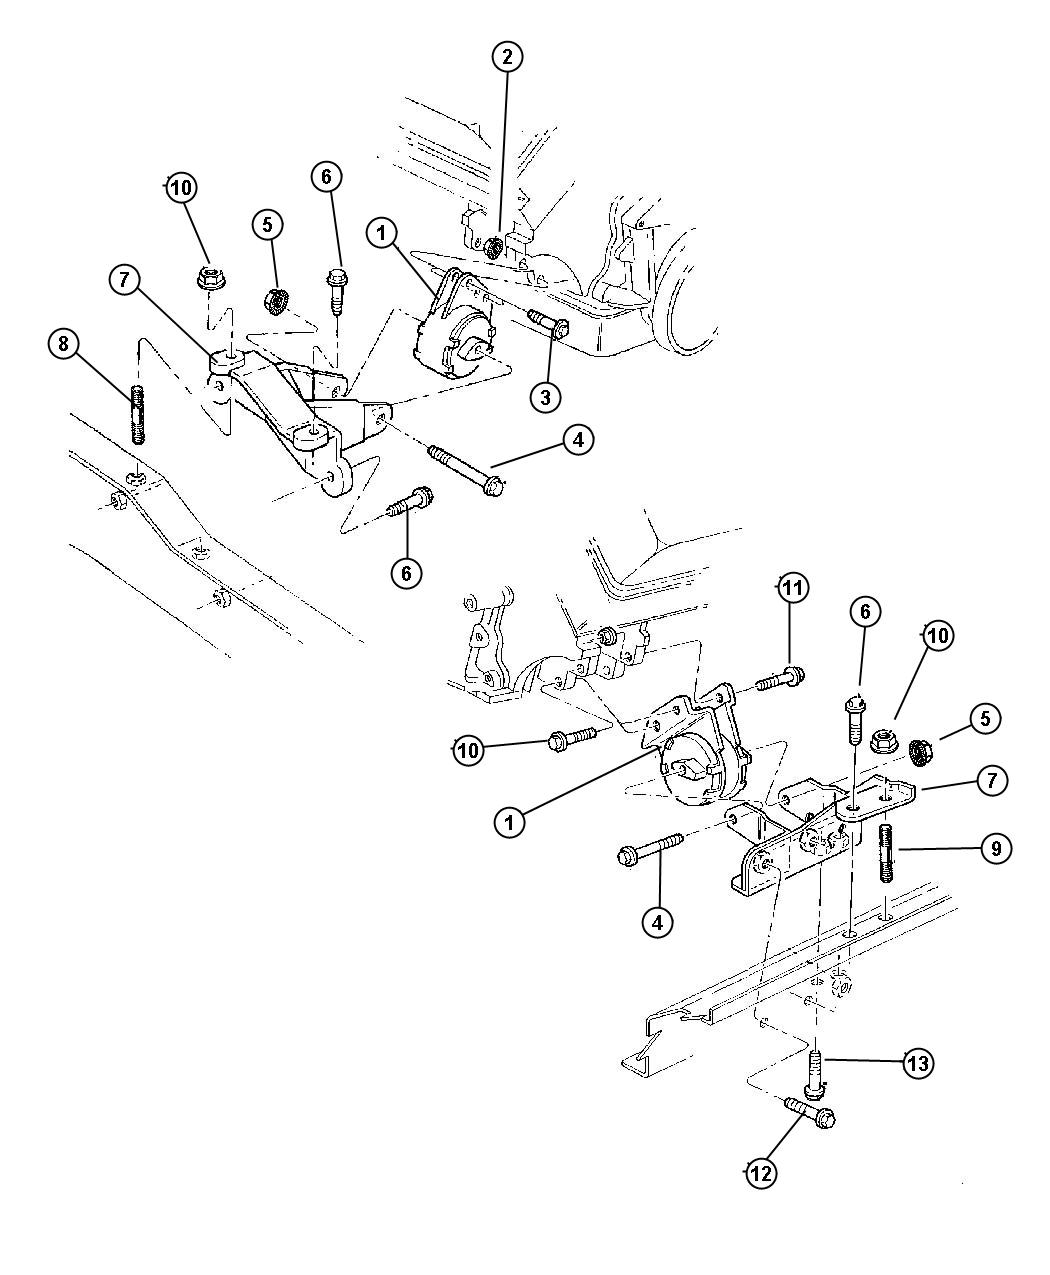 Dodge Nitro Bolt. Mounting. Hex flange head. M12x1.75x40